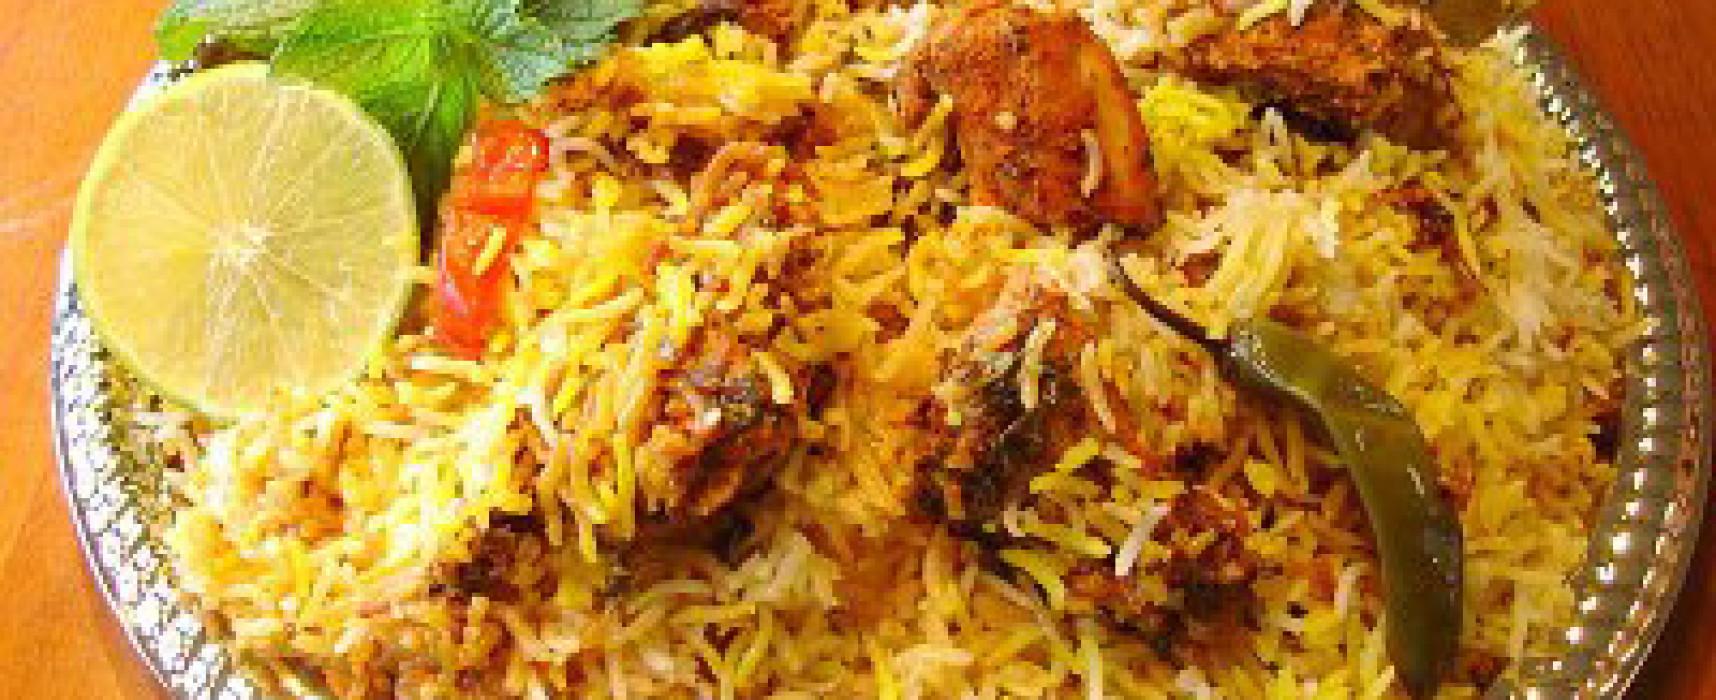 Cuisine of the Kings: Mughlai Food